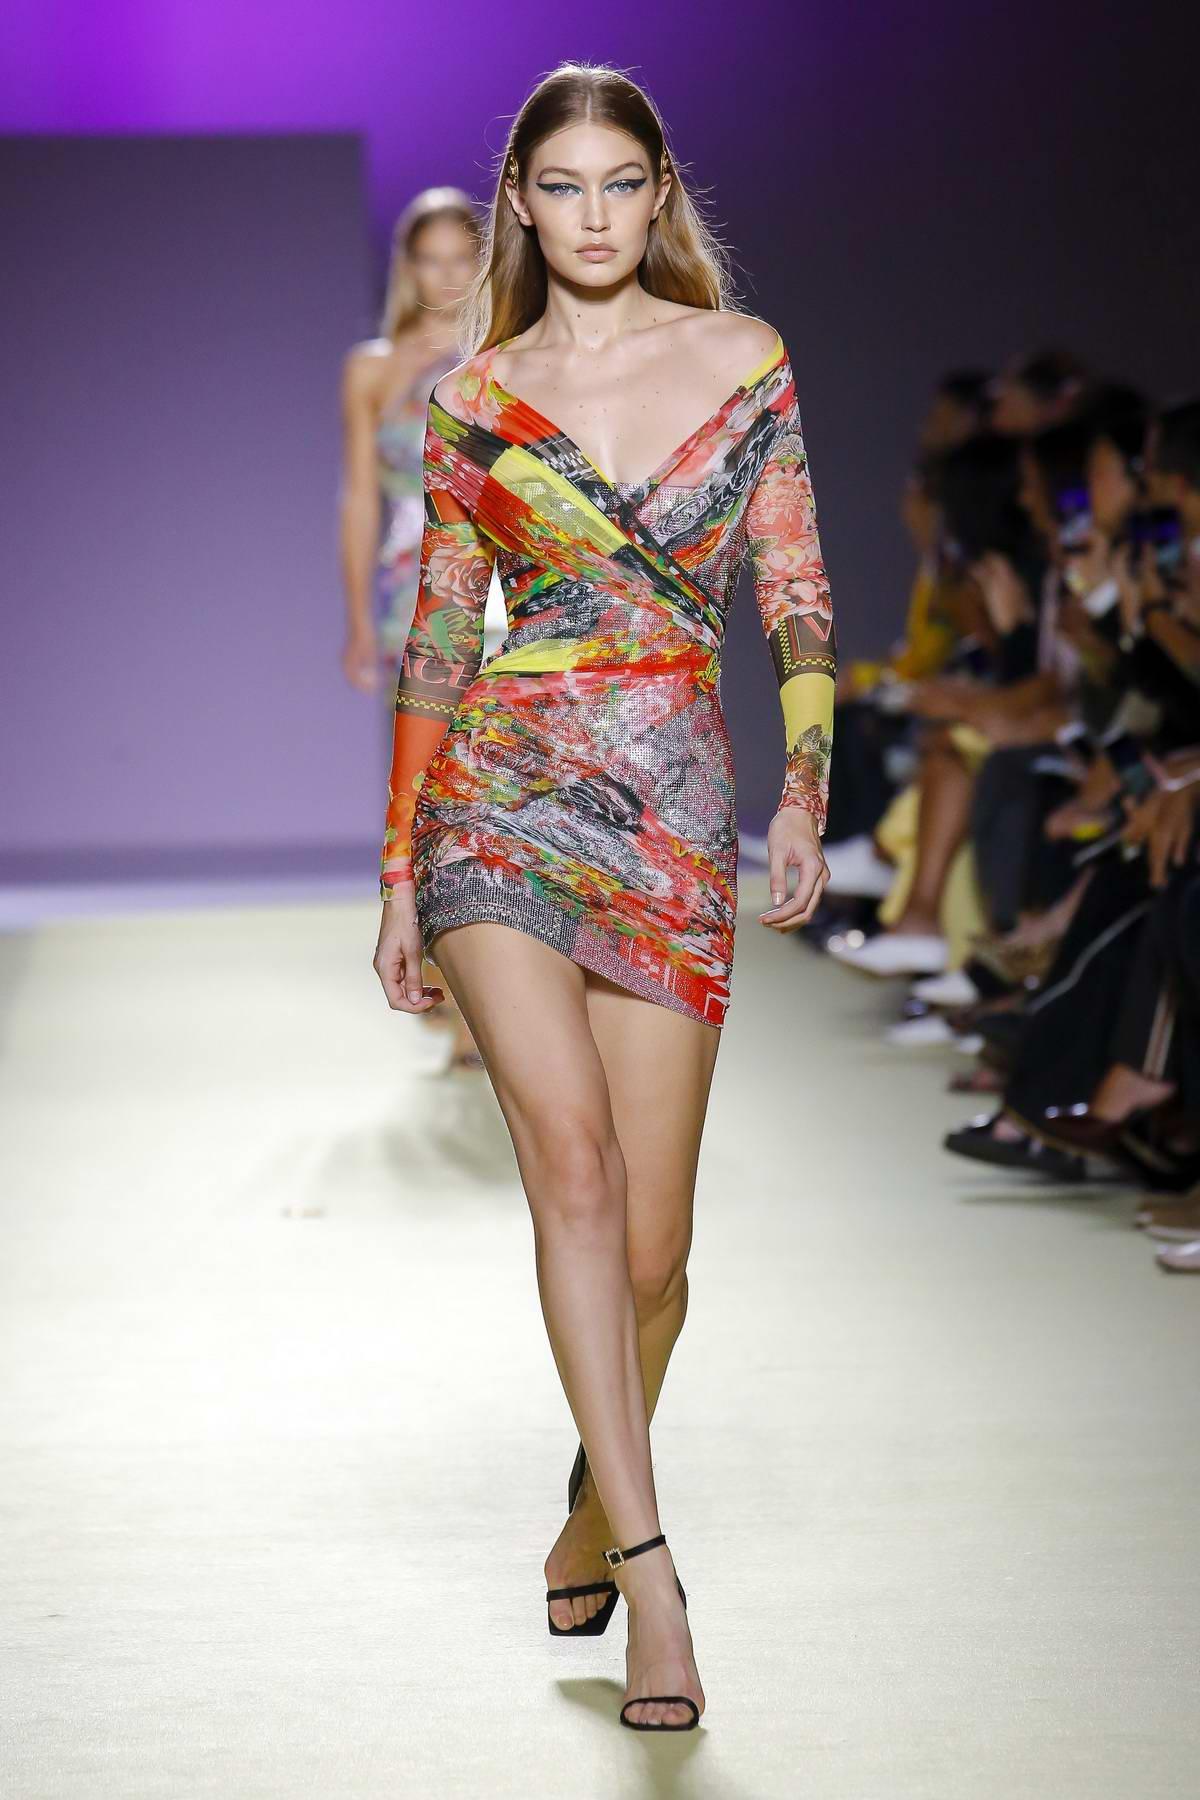 67a04ce49d8 Gigi Hadid walks the runway at Versace Fashion Show during Milan Fashion  Week